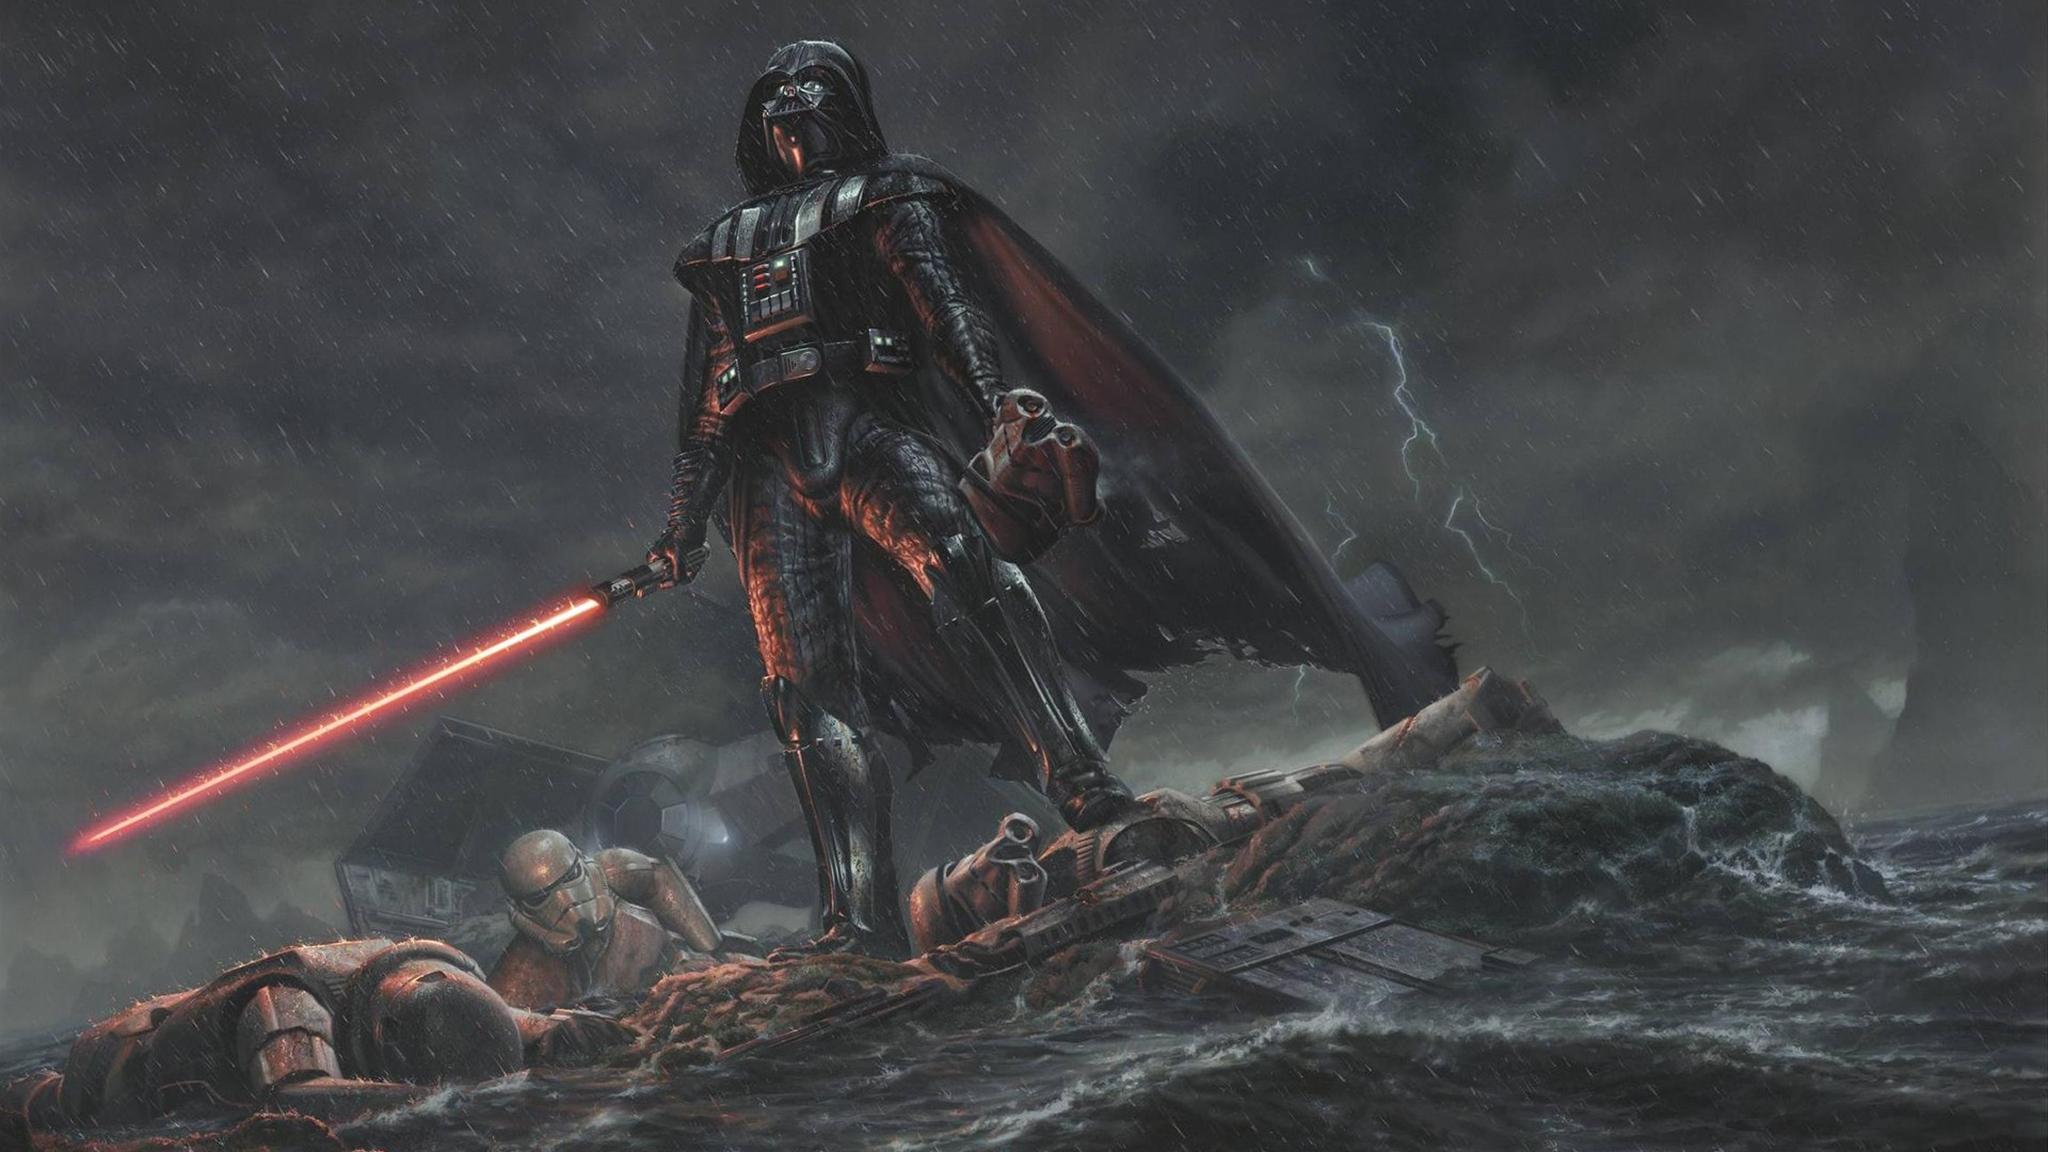 2048x1152 Darth Vader Star Wars 4k 2048x1152 Resolution HD